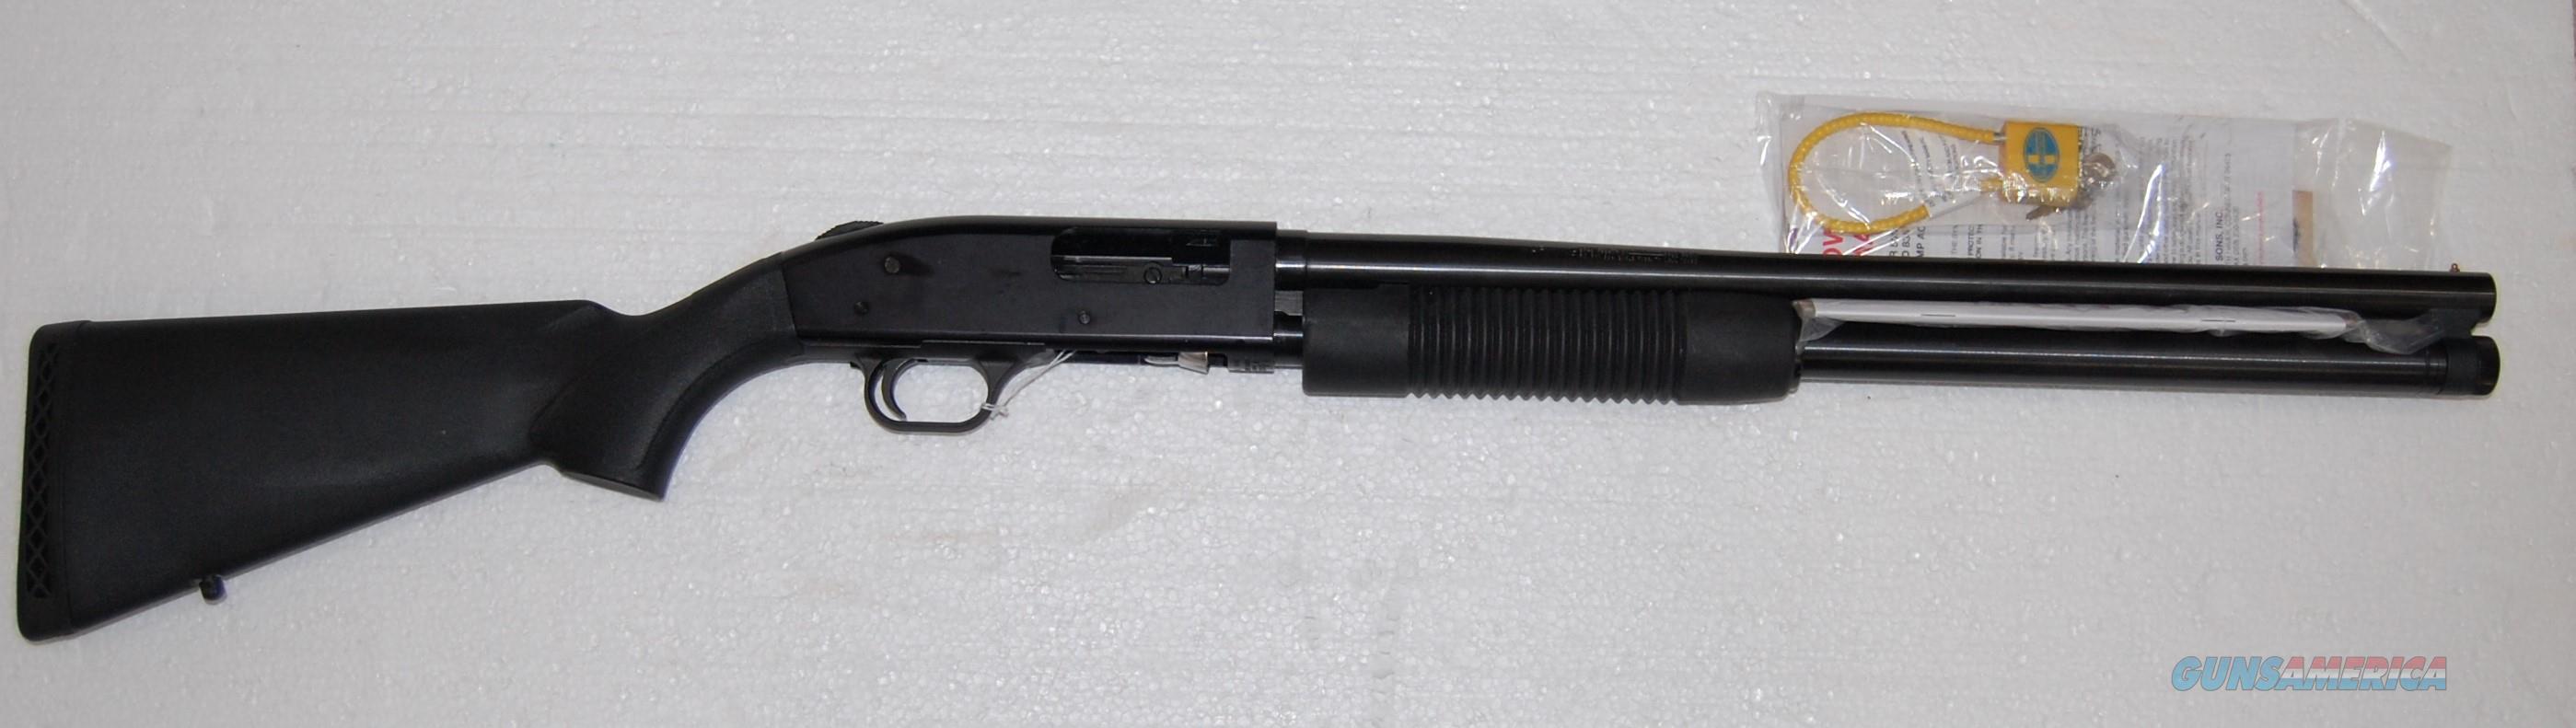 Mossberg 500 tactical shotgun  Guns > Shotguns > Mossberg Shotguns > Pump > Tactical